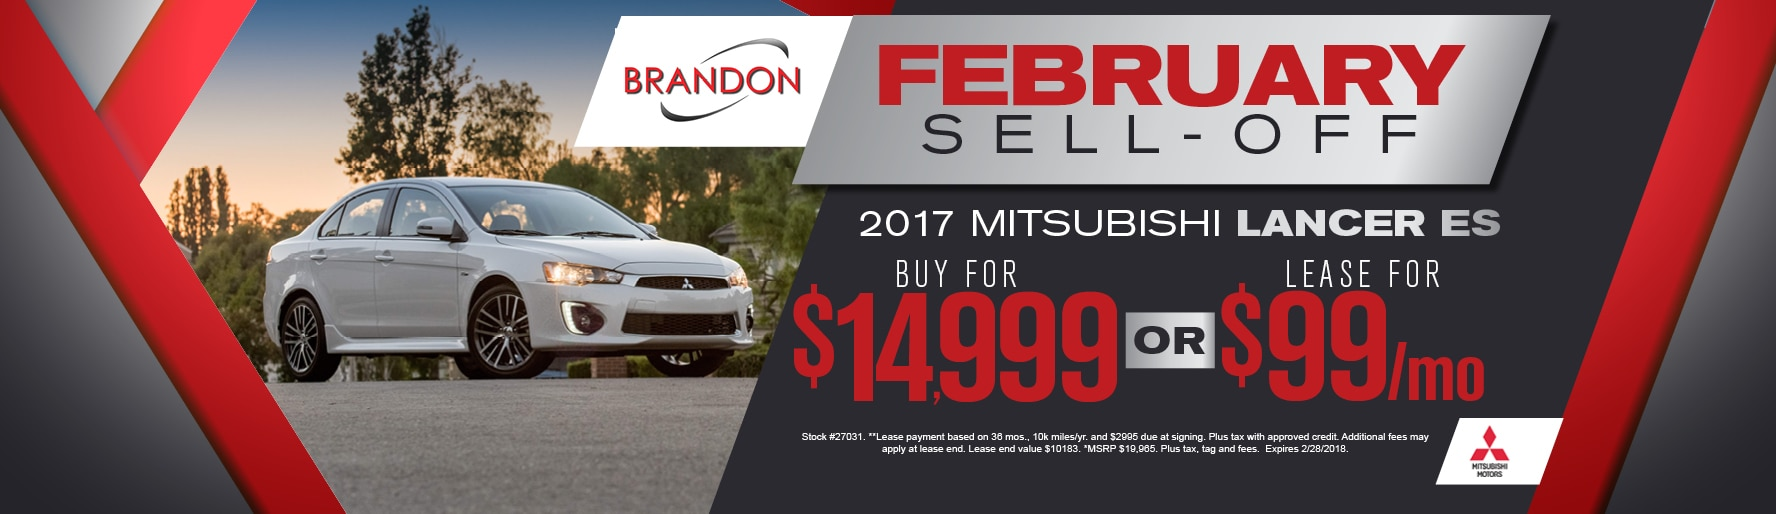 Brandon Mitsubishi New Mitsubishi Dealership In Tampa FL - Mitsubishi dealer link